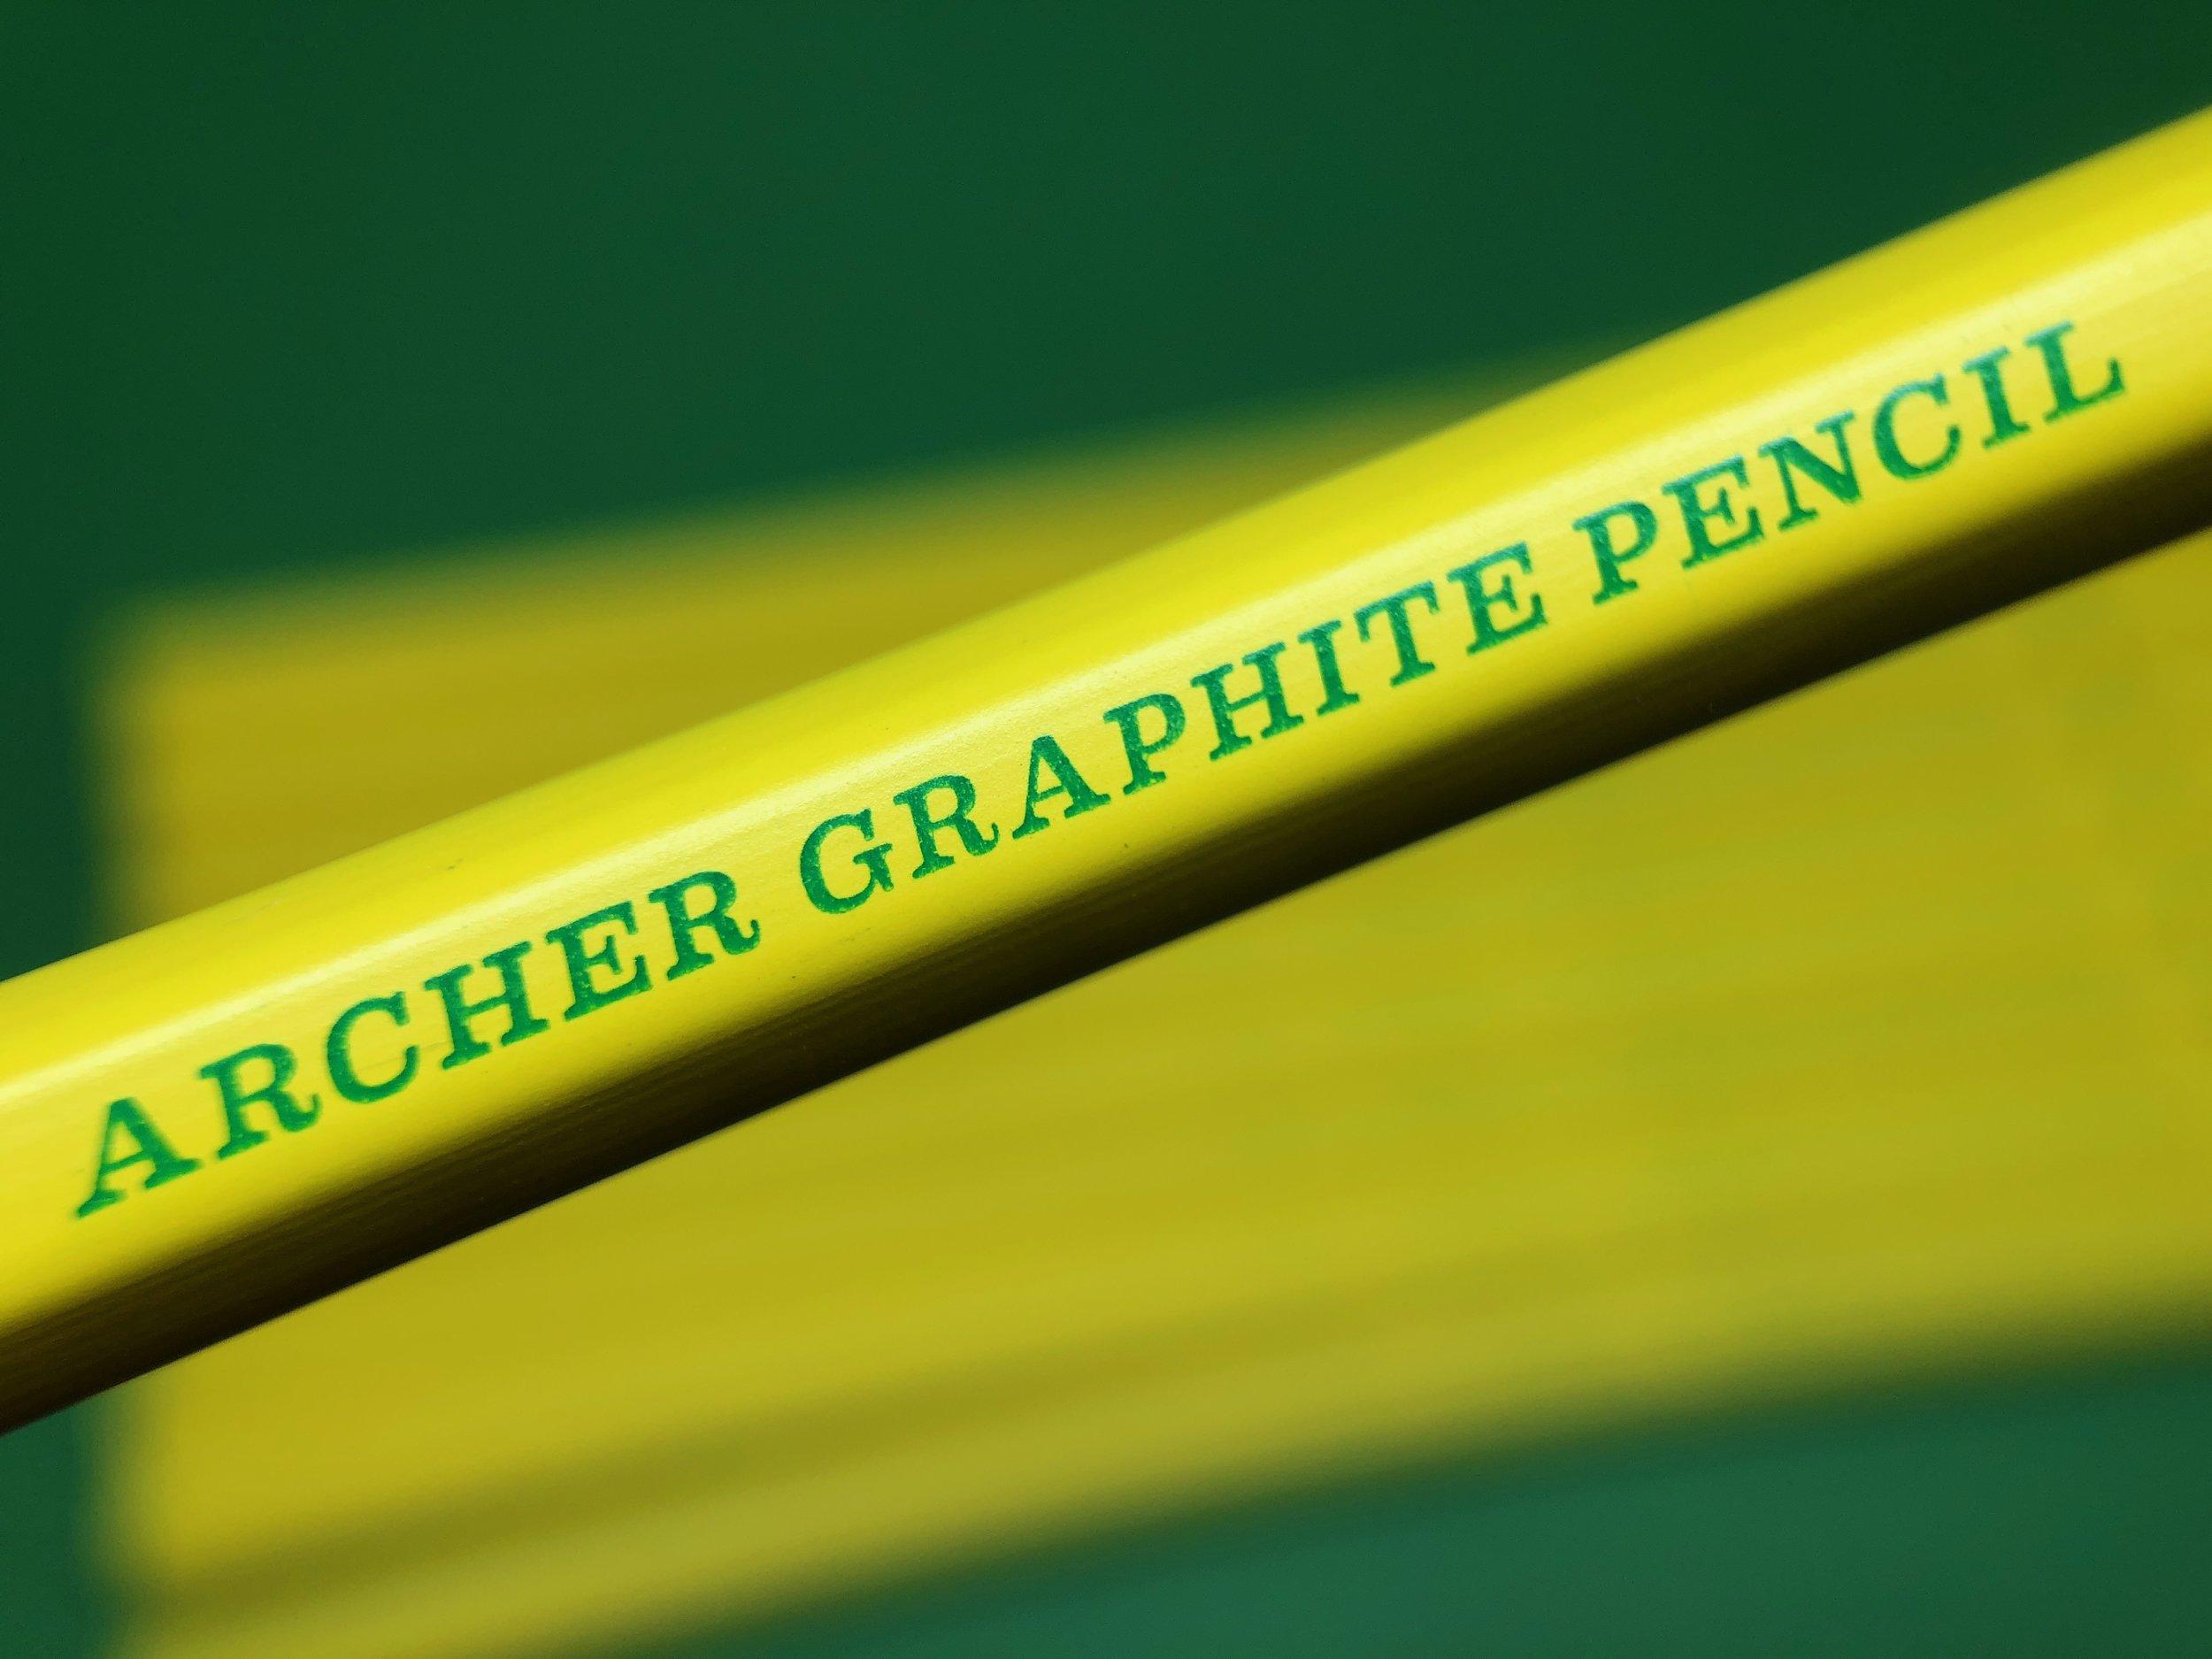 baron-fig-archer-school-pencil-12.jpg